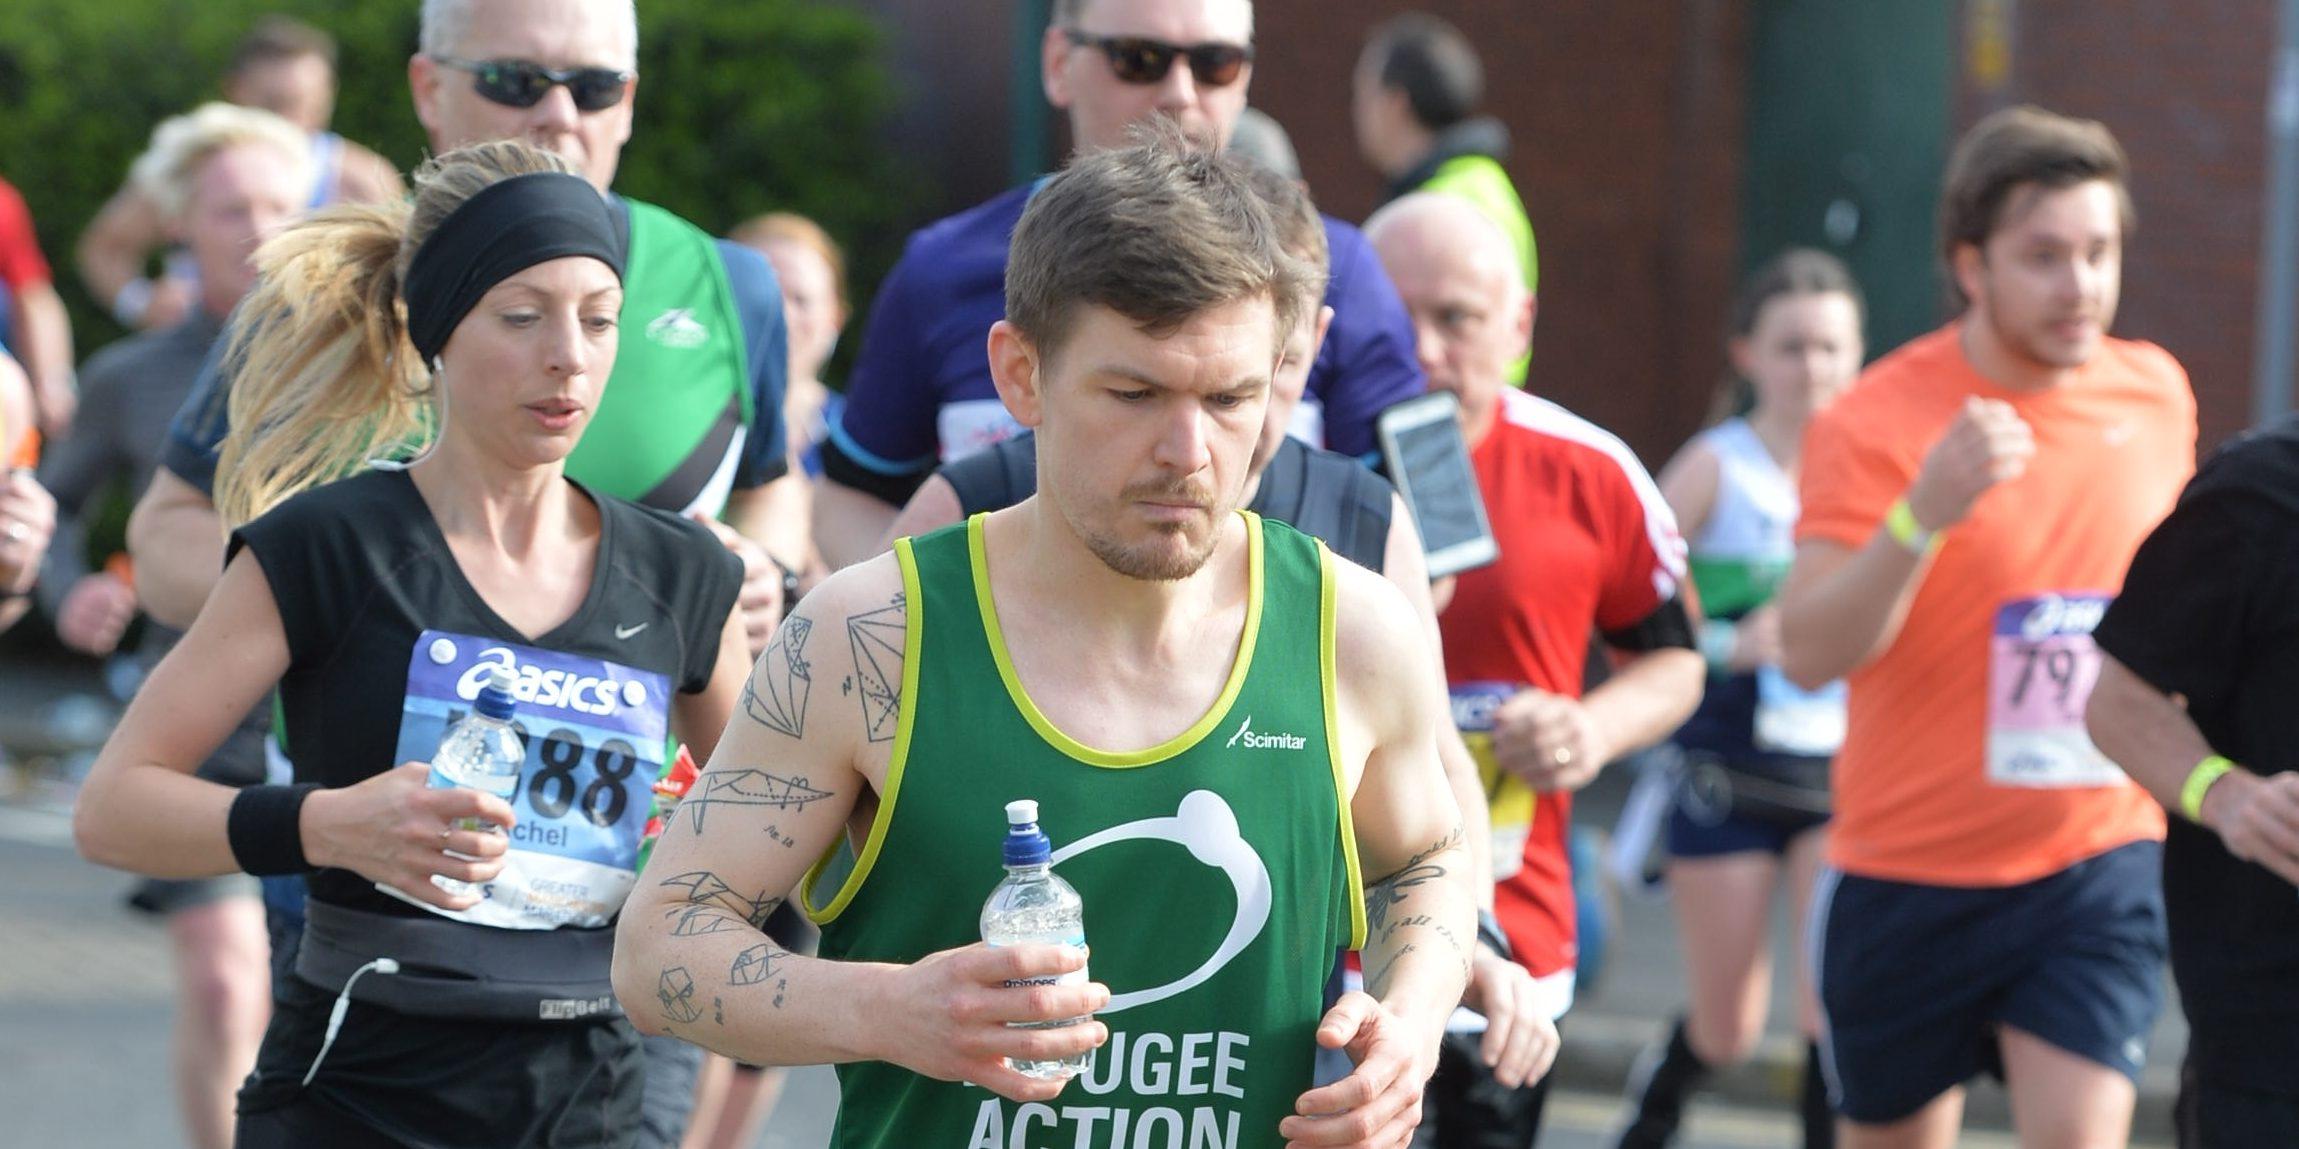 a man wearing a Refugee Action vest running a race